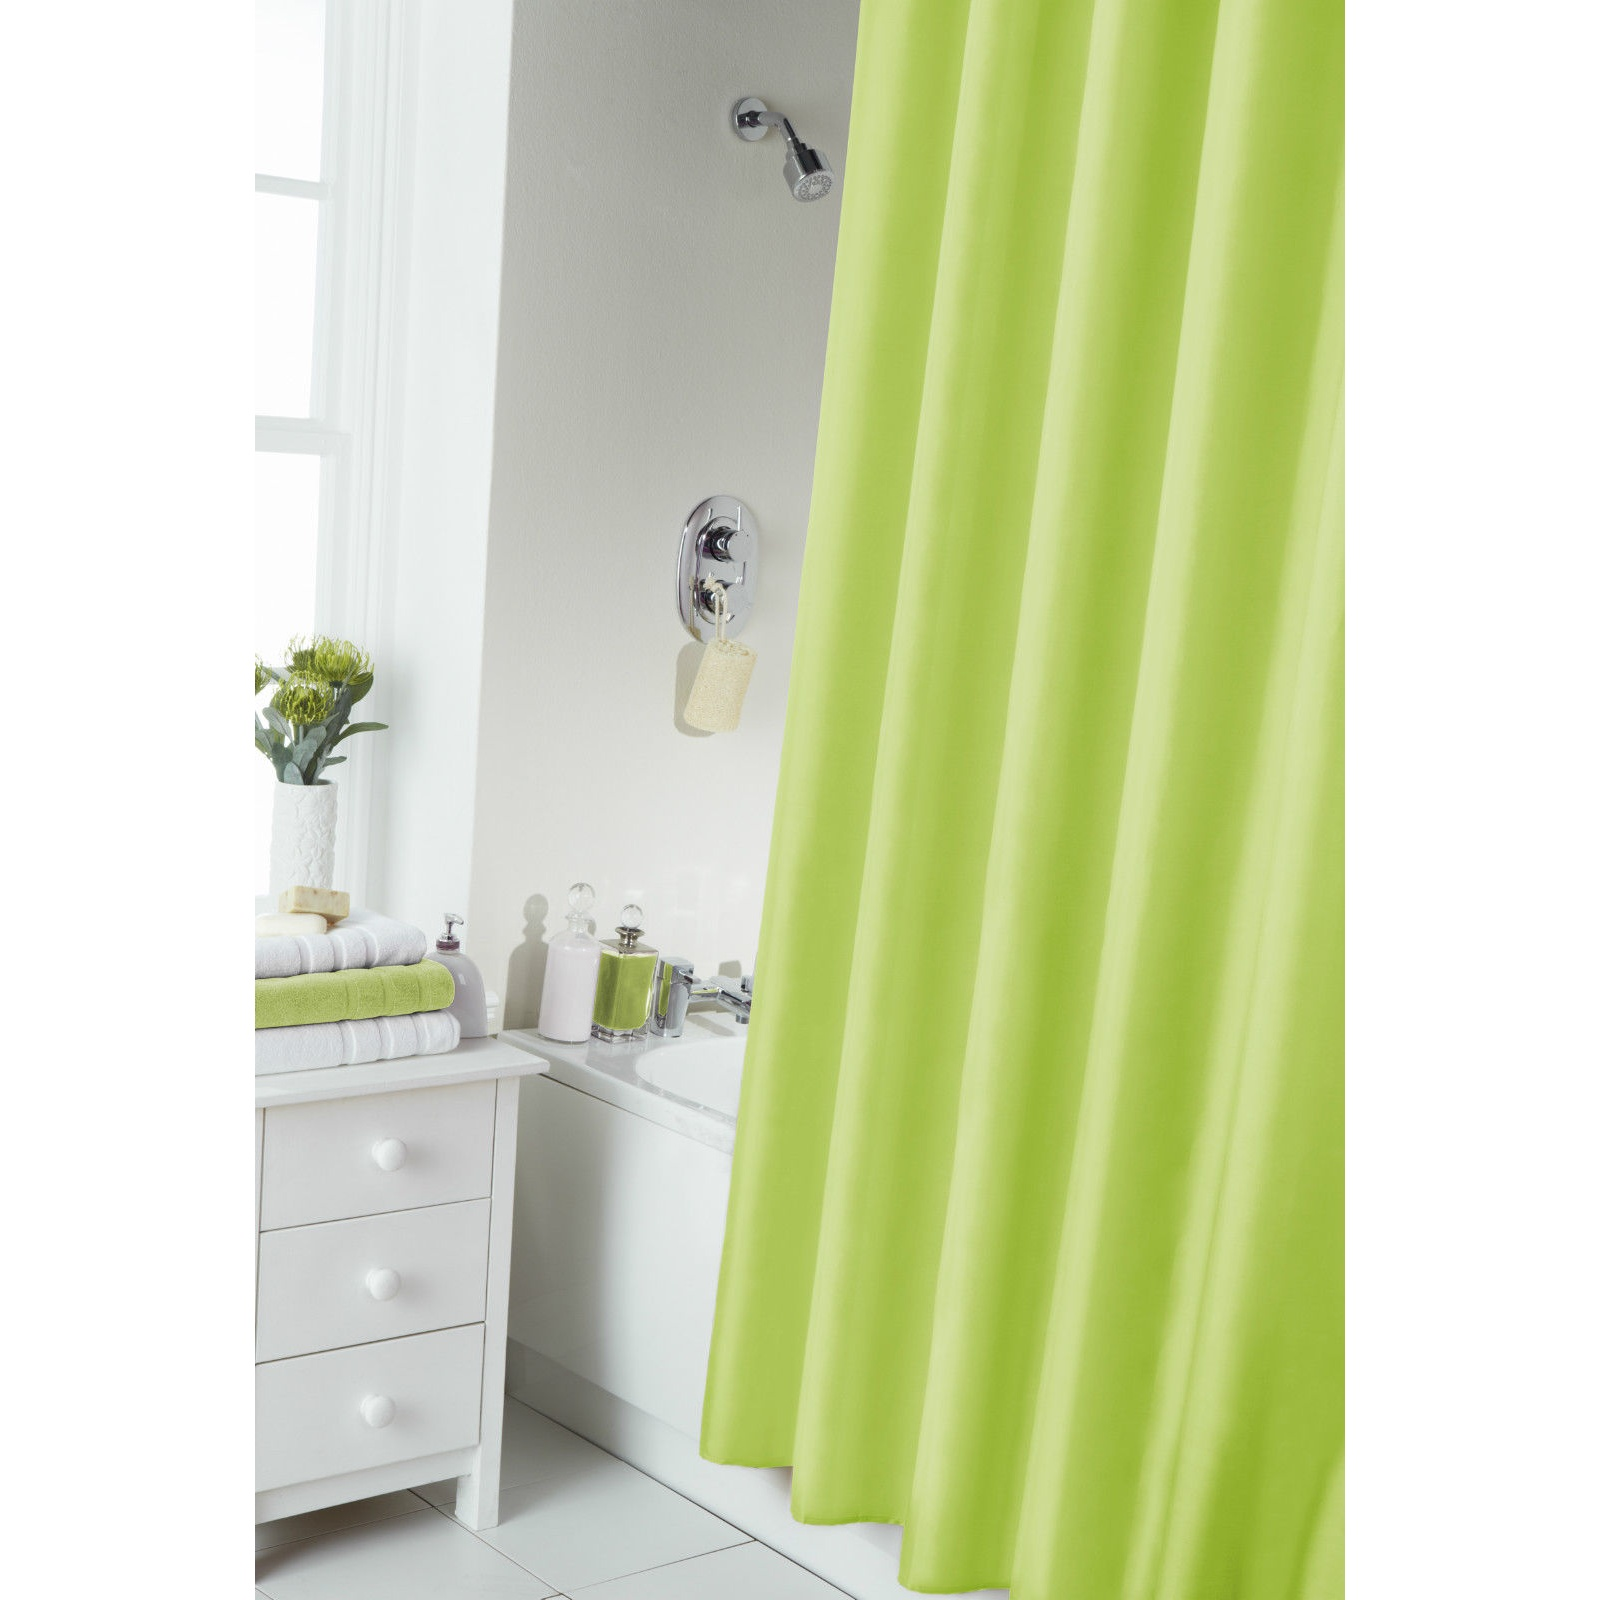 Cortinas de ba o lisas con anillas ms172 ebay for Anillas plastico para cortinas